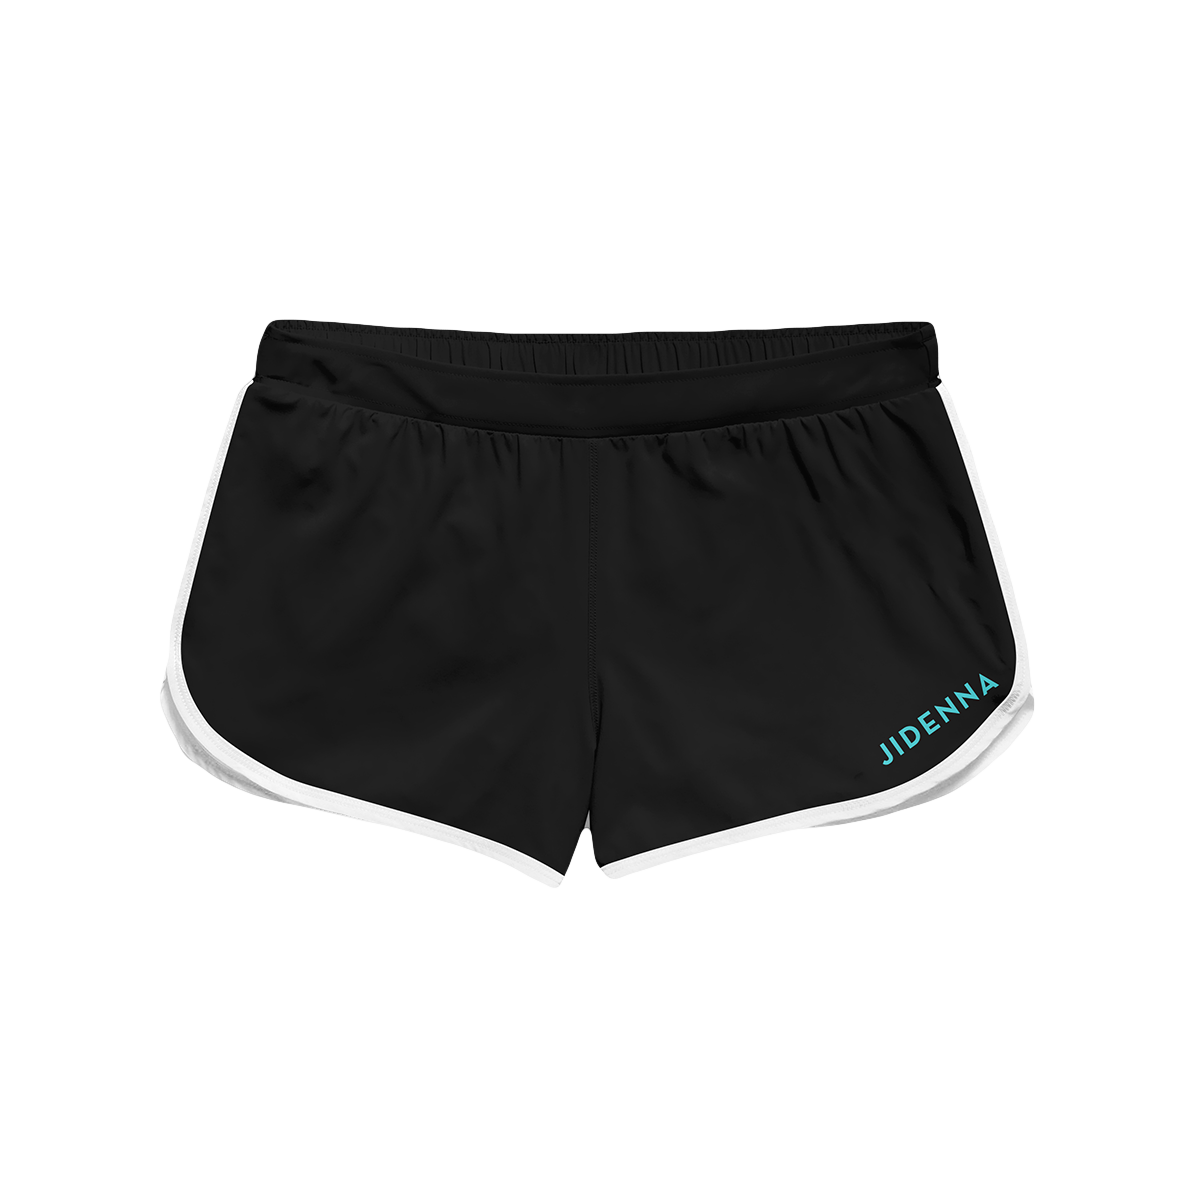 Trampoline Shorts